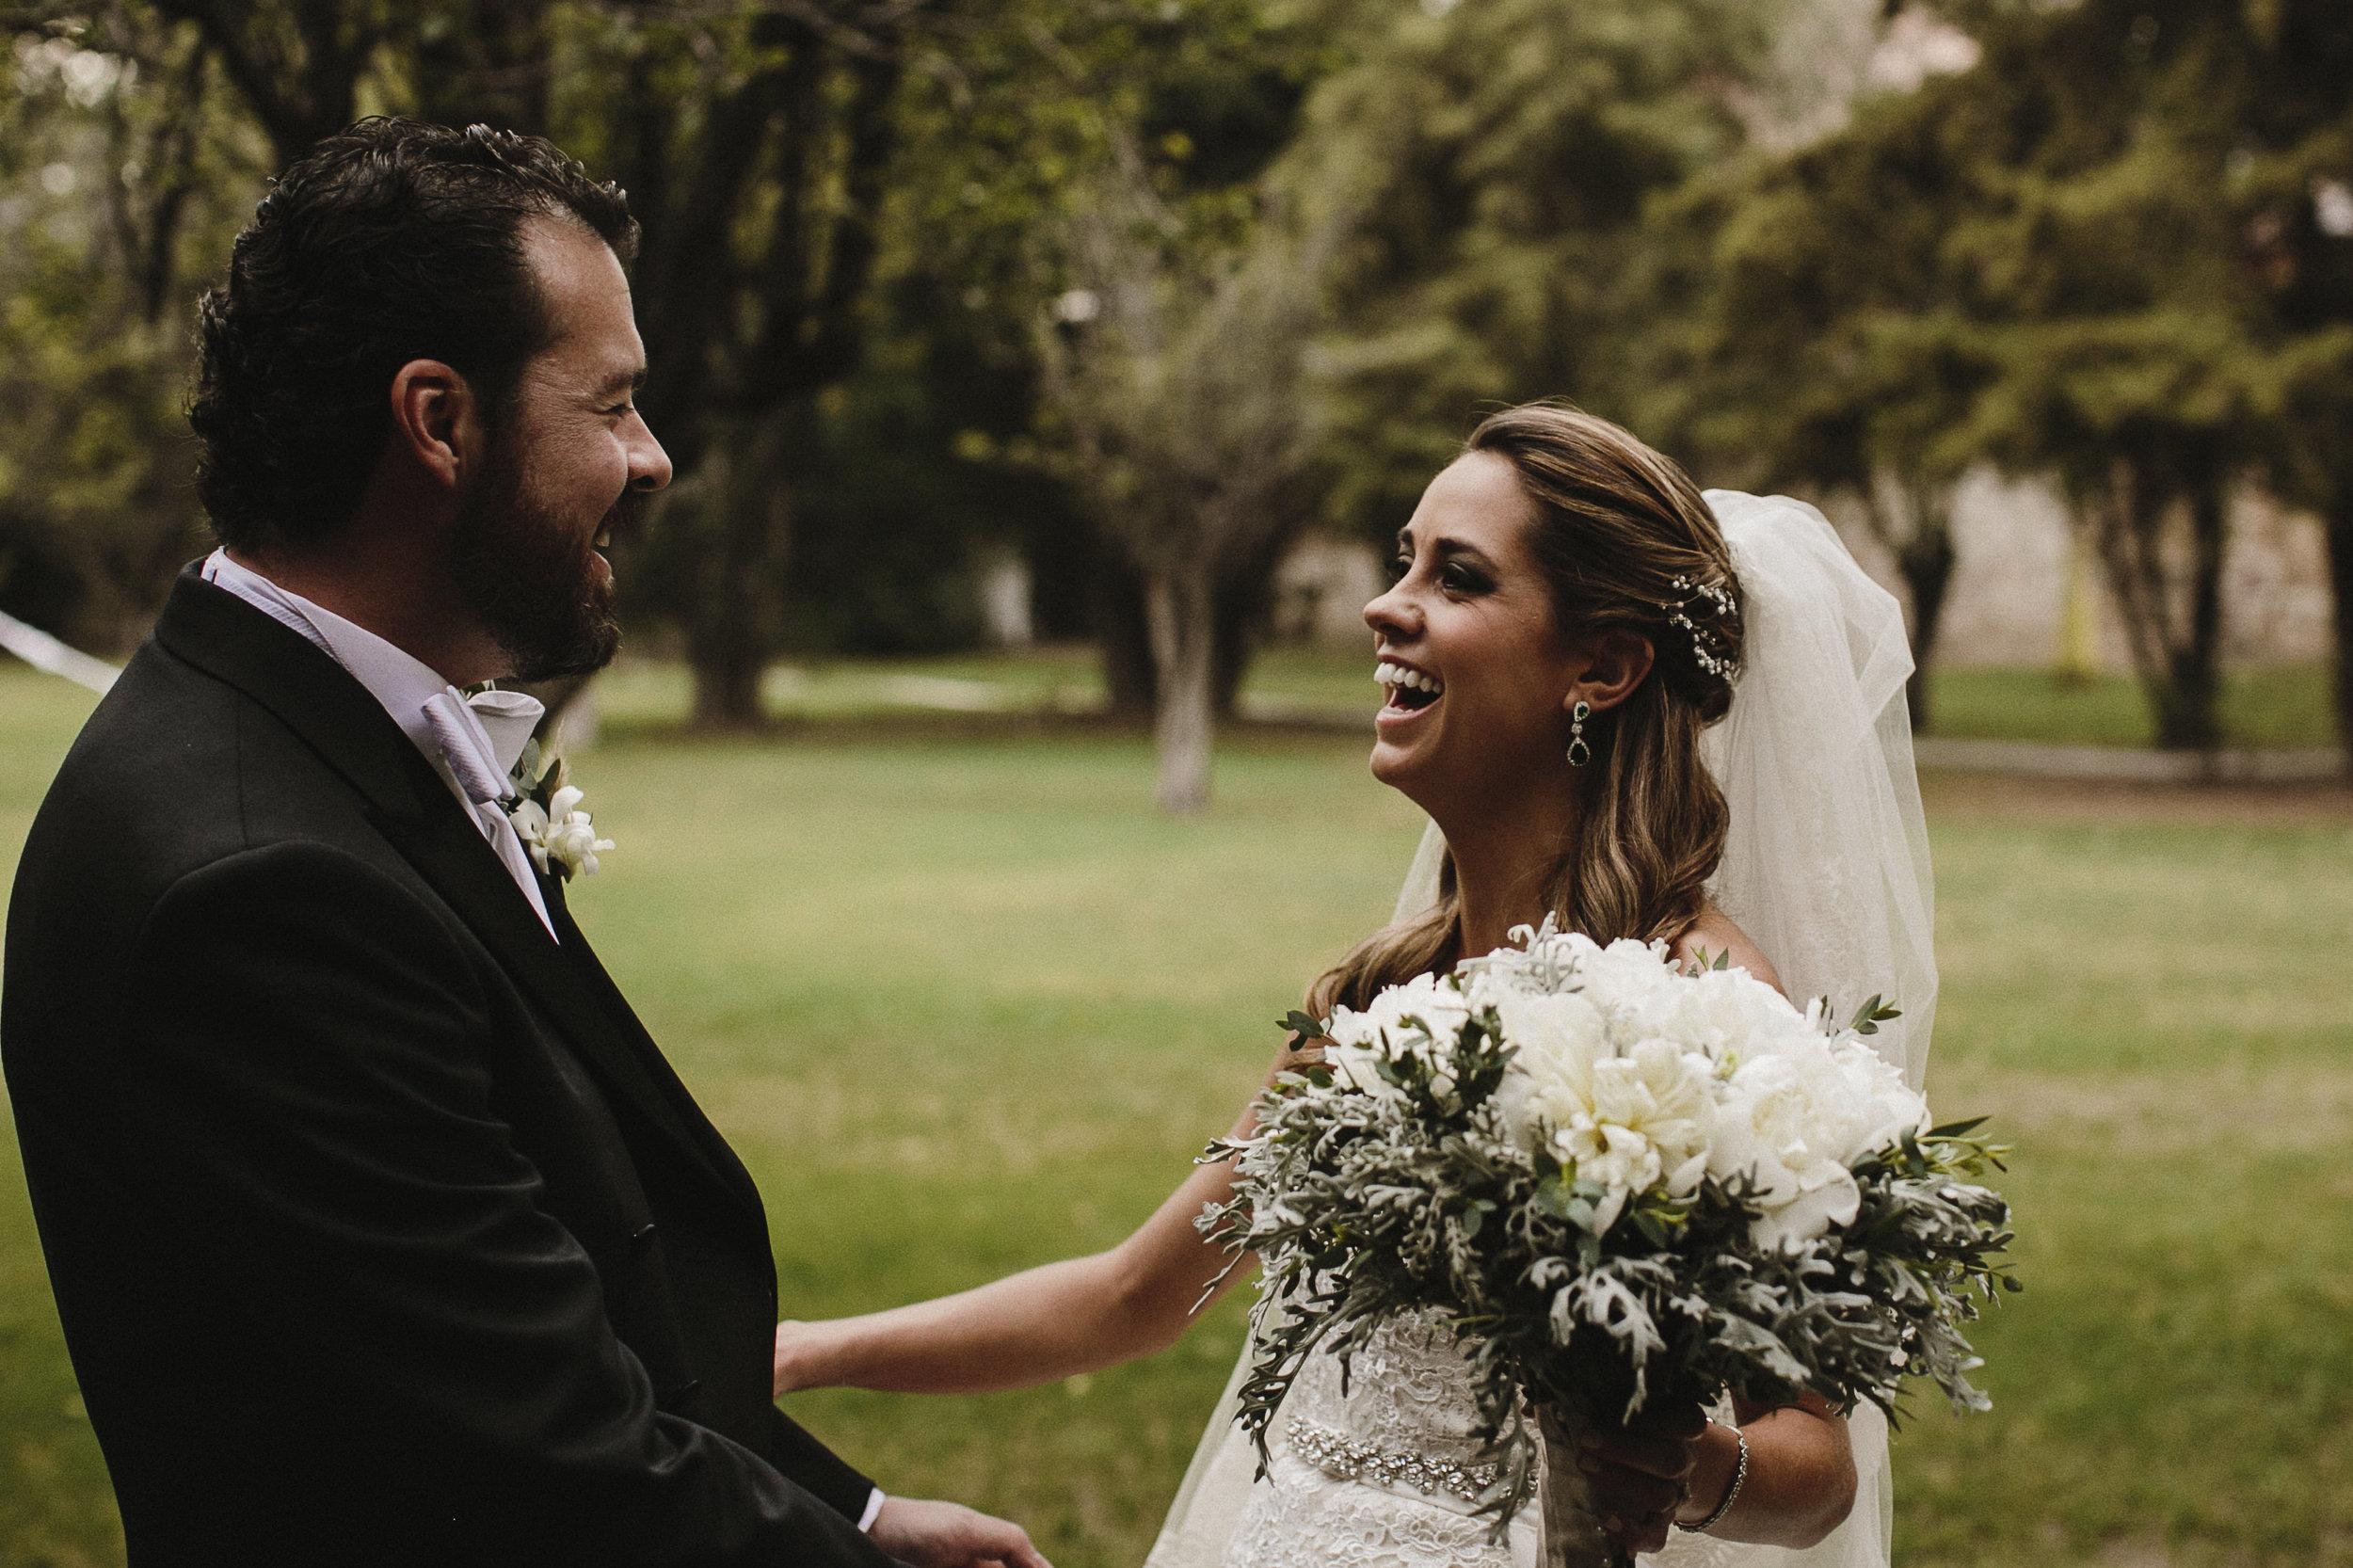 alfonso_flores_destination_wedding_photogrpahy_paola_alonso-169.JPG